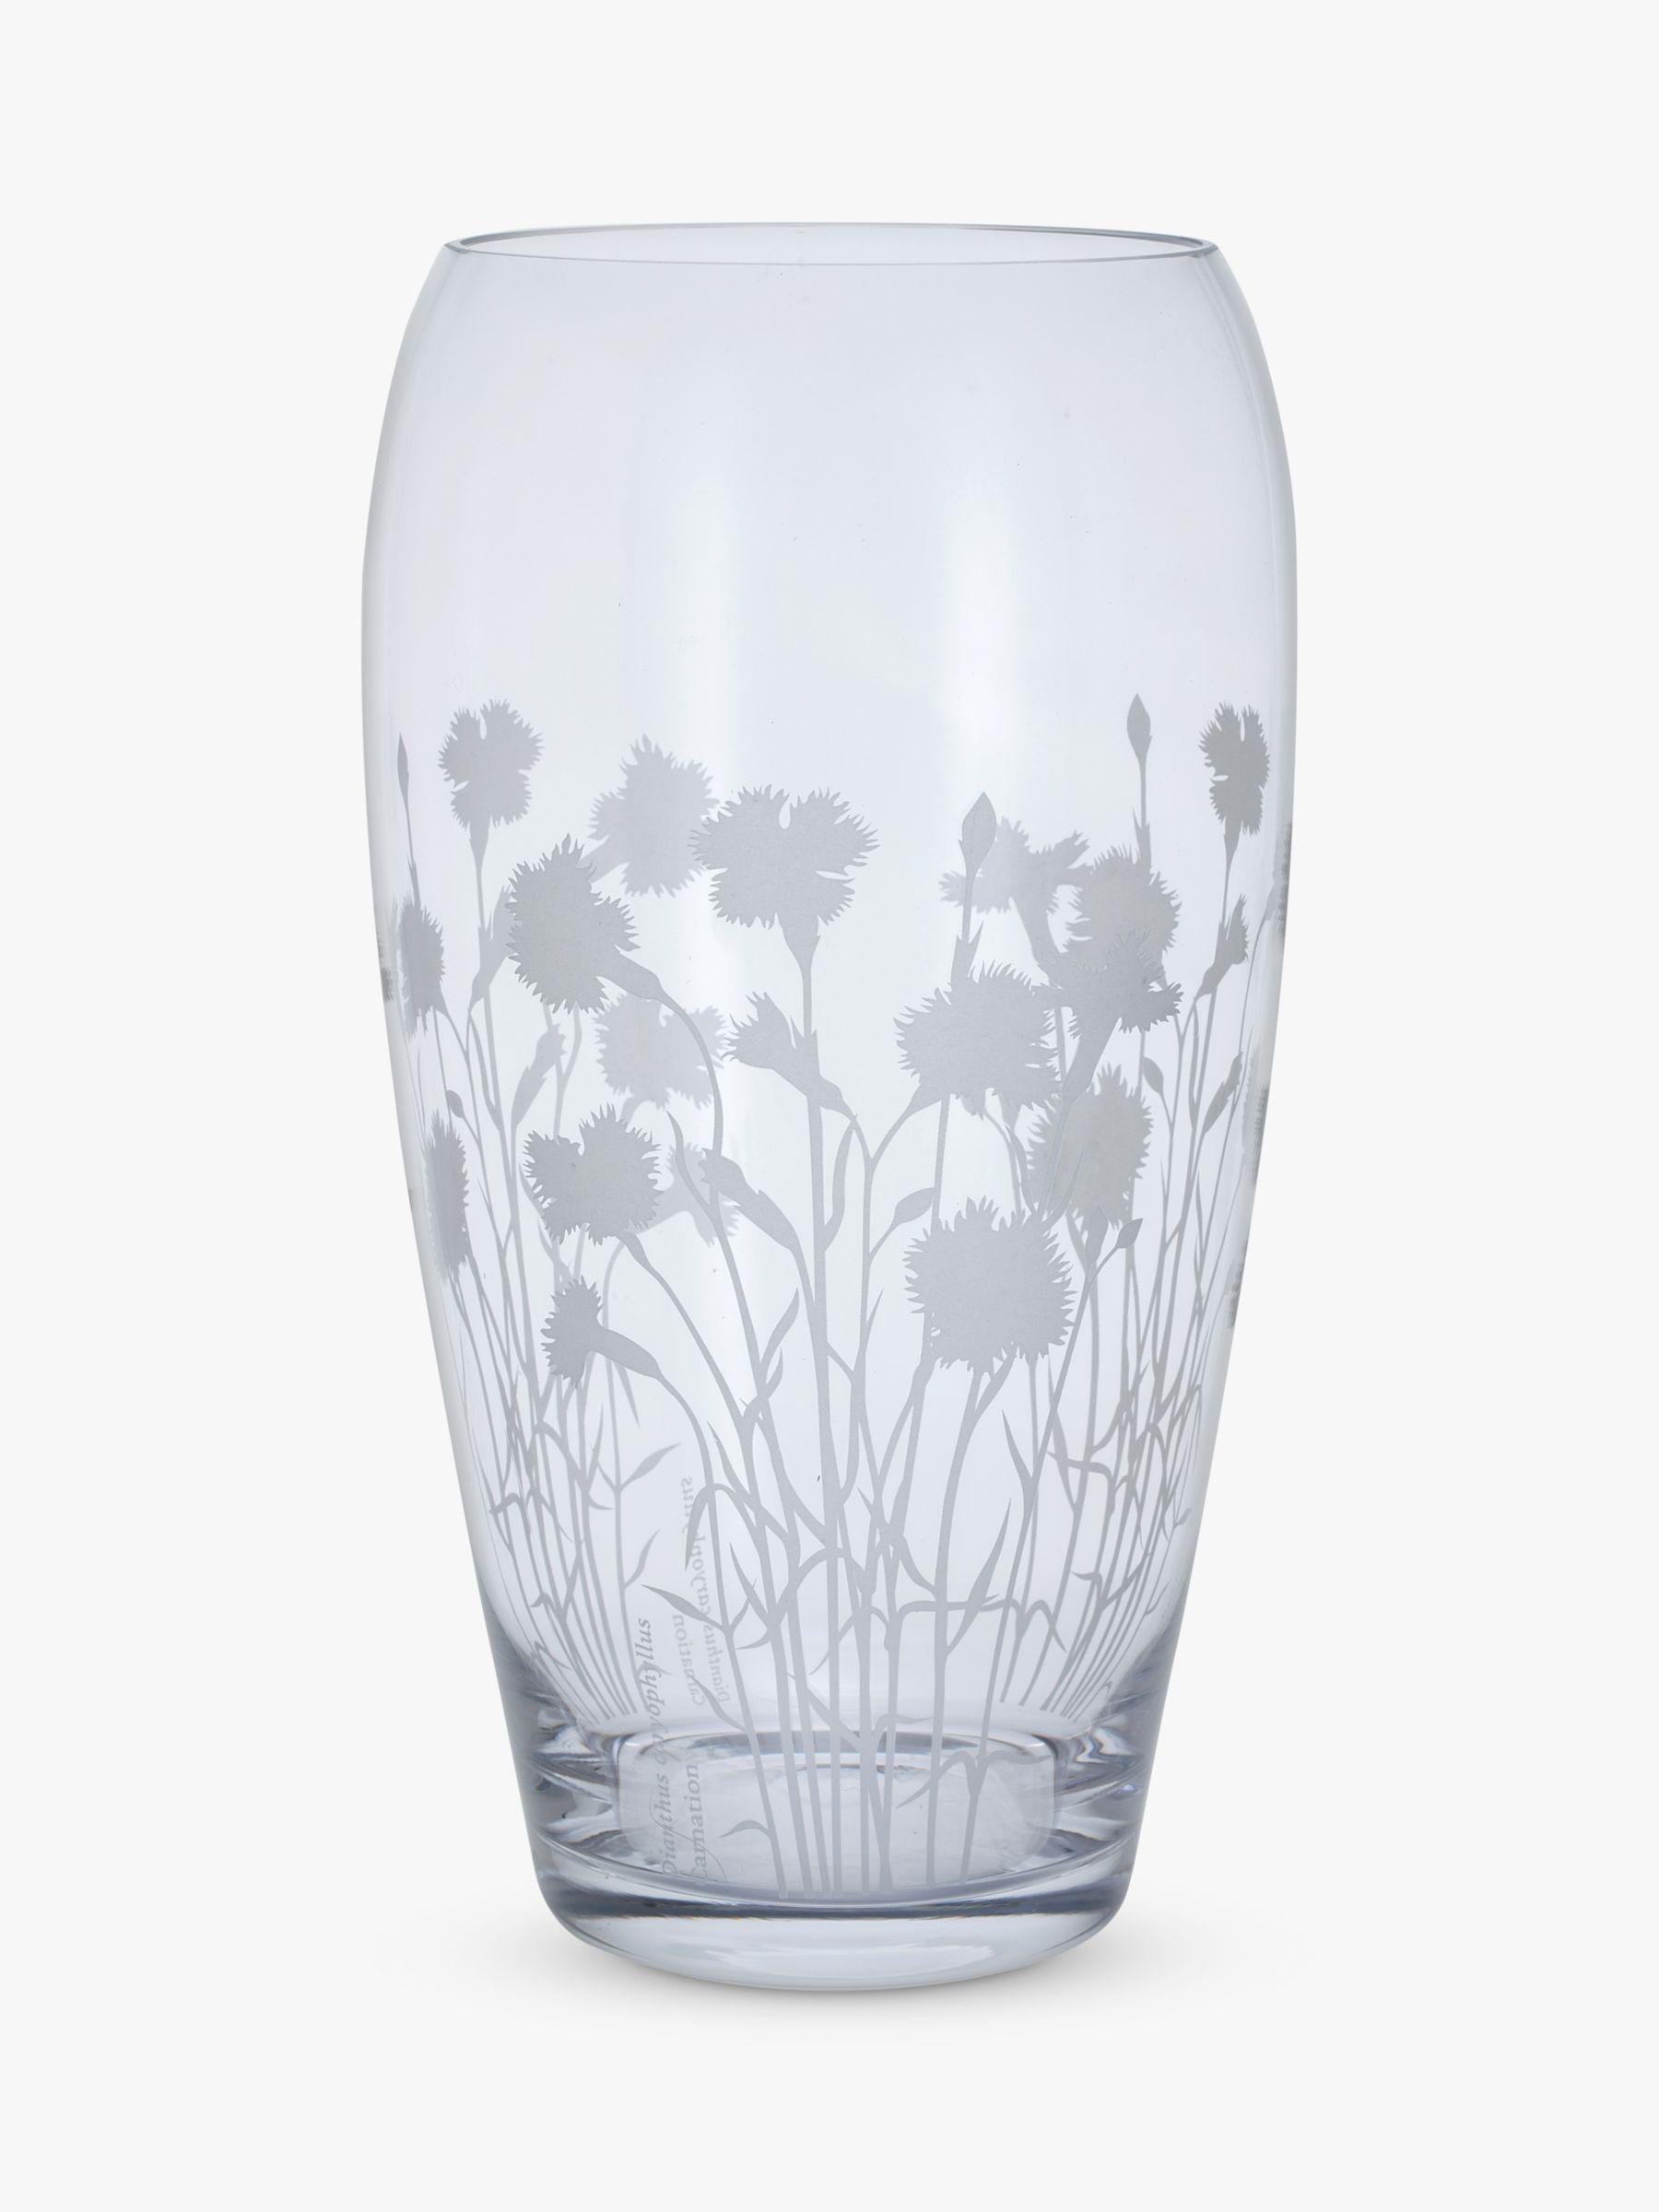 Dartington Crystal Dartington Crystal Bloom Dianthus Glass Vase, H30cm, Clear